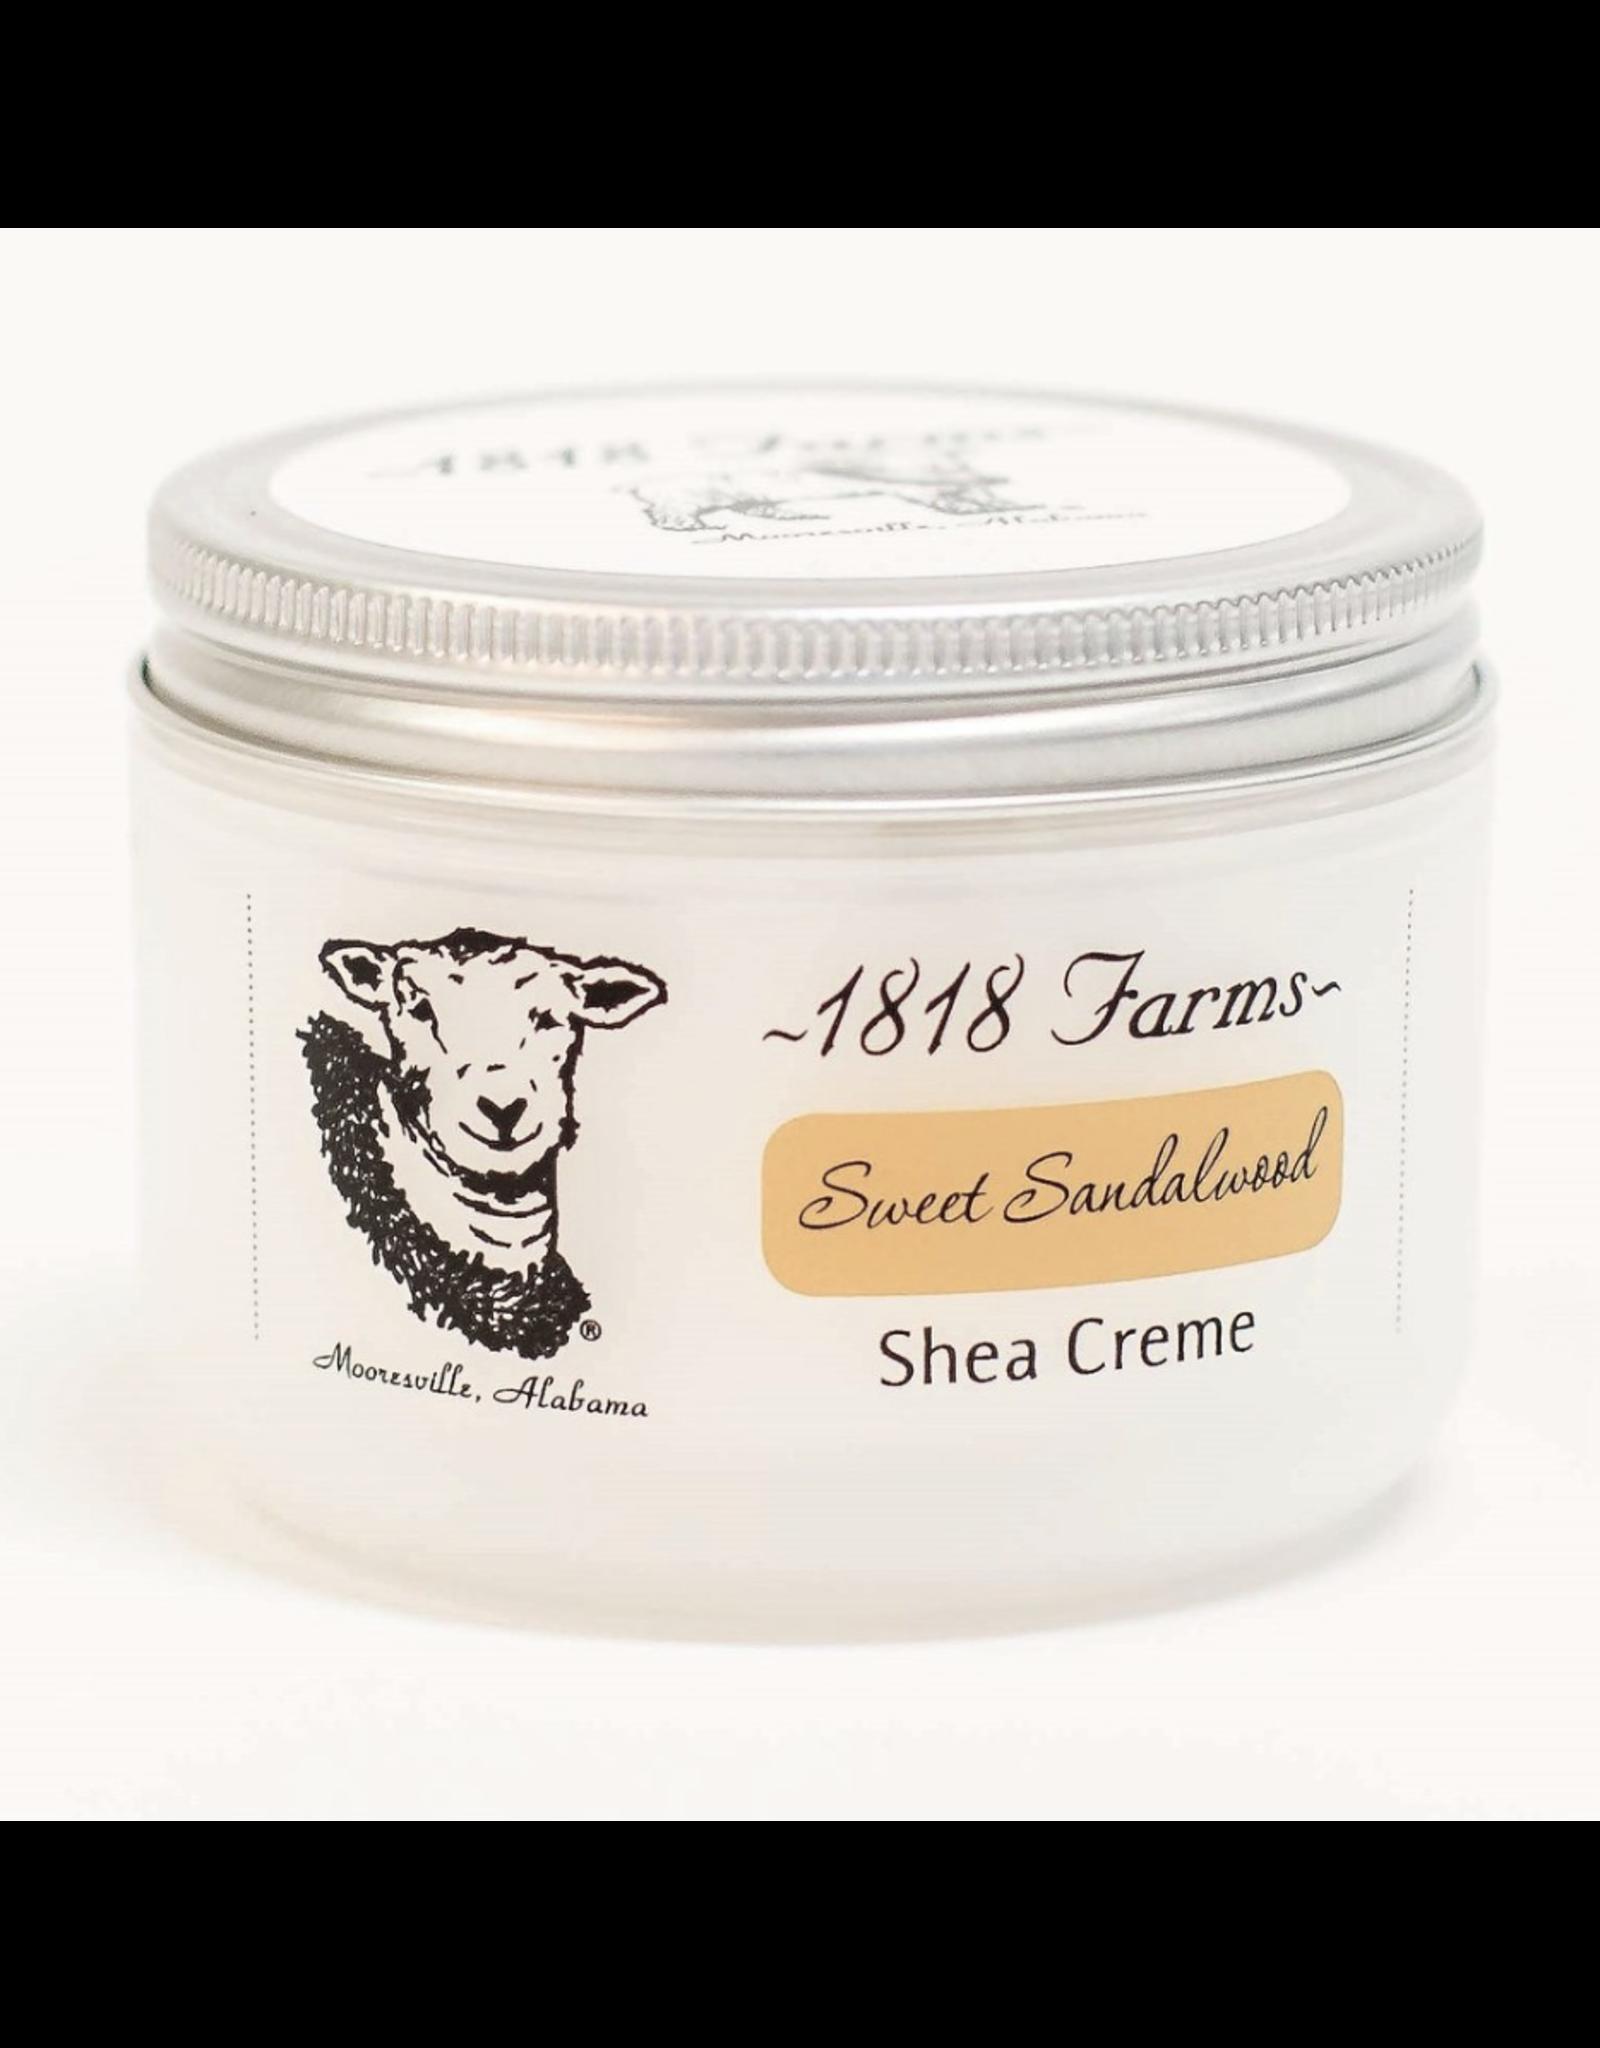 1818 Farms Shea Creme Sweet Sandalwood 4 OZ